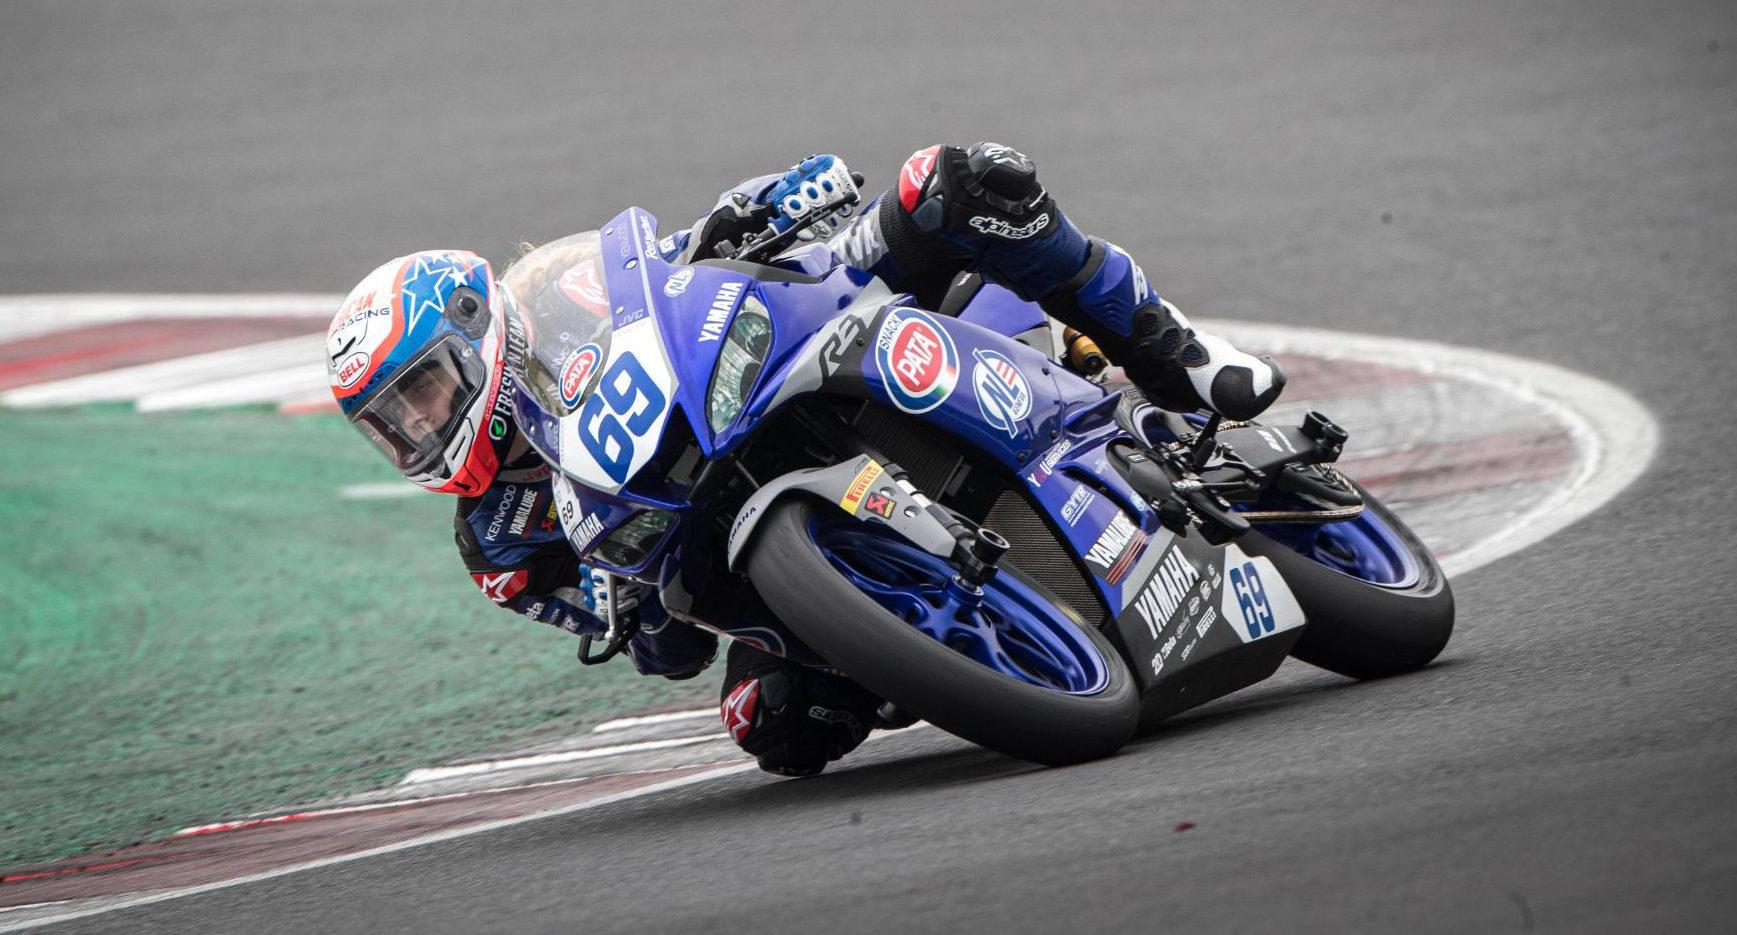 American Kayla Yaakov (69) in action at Misano. Photo courtesy Yamaha Racing.